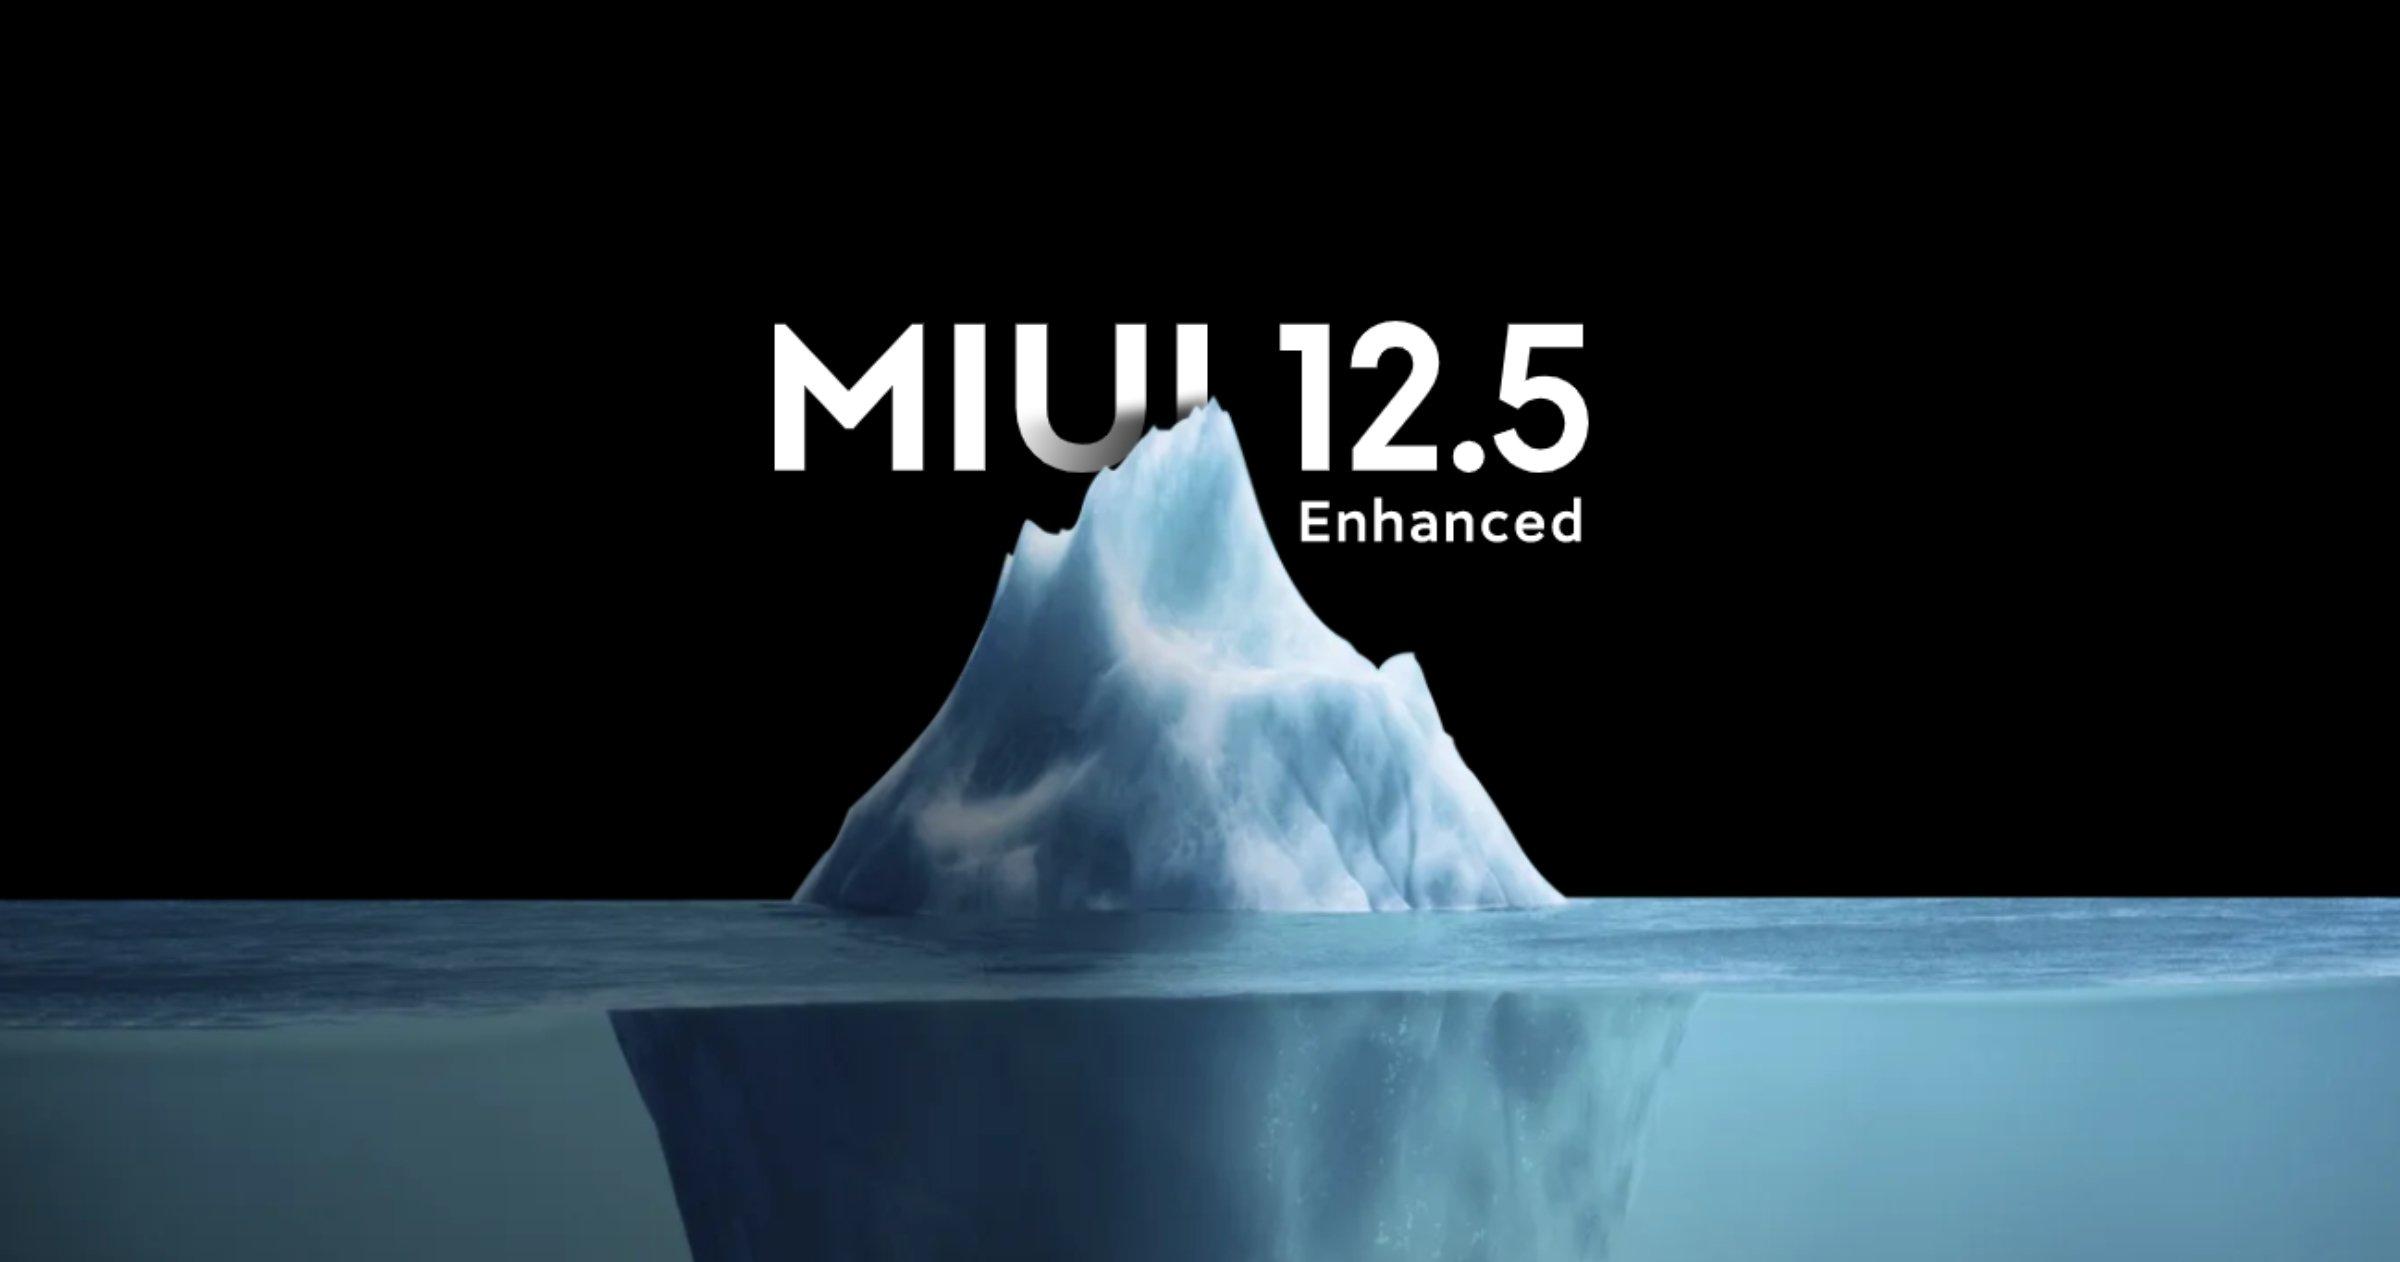 MIUI 12.5 Édition améliorée